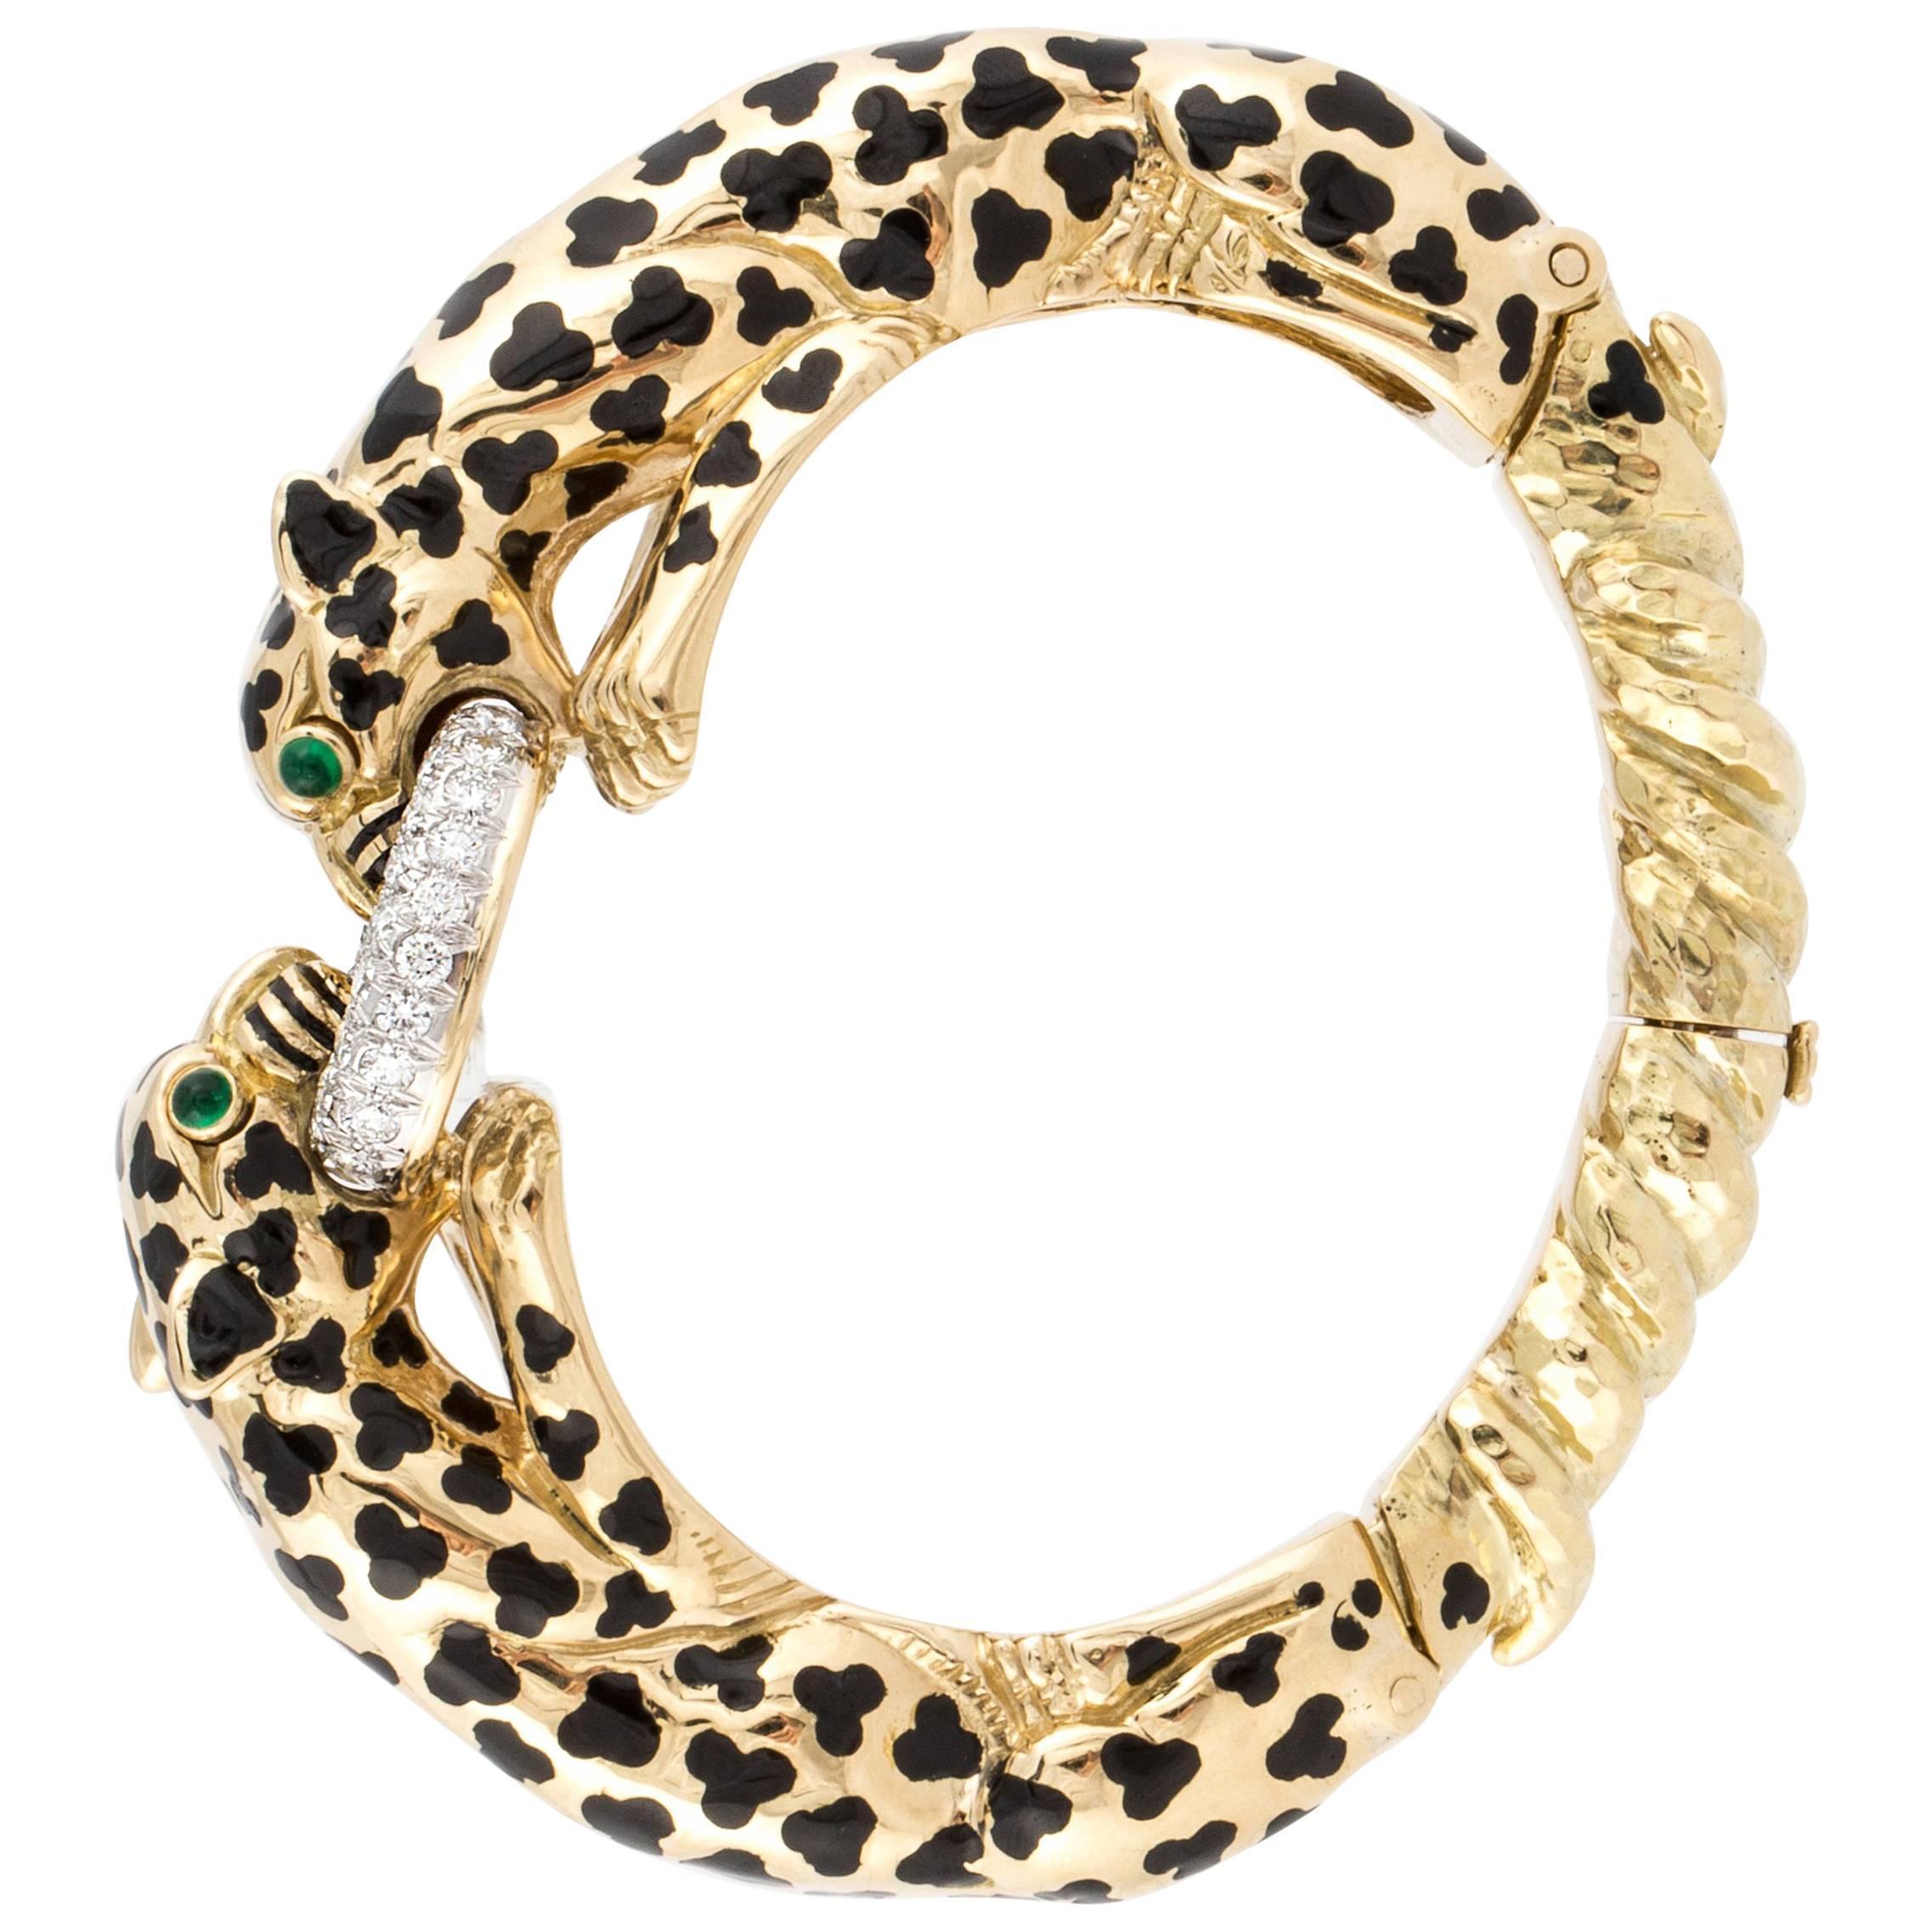 David Webb 18K Yellow Gold Double Leopard Bangle Bracelet